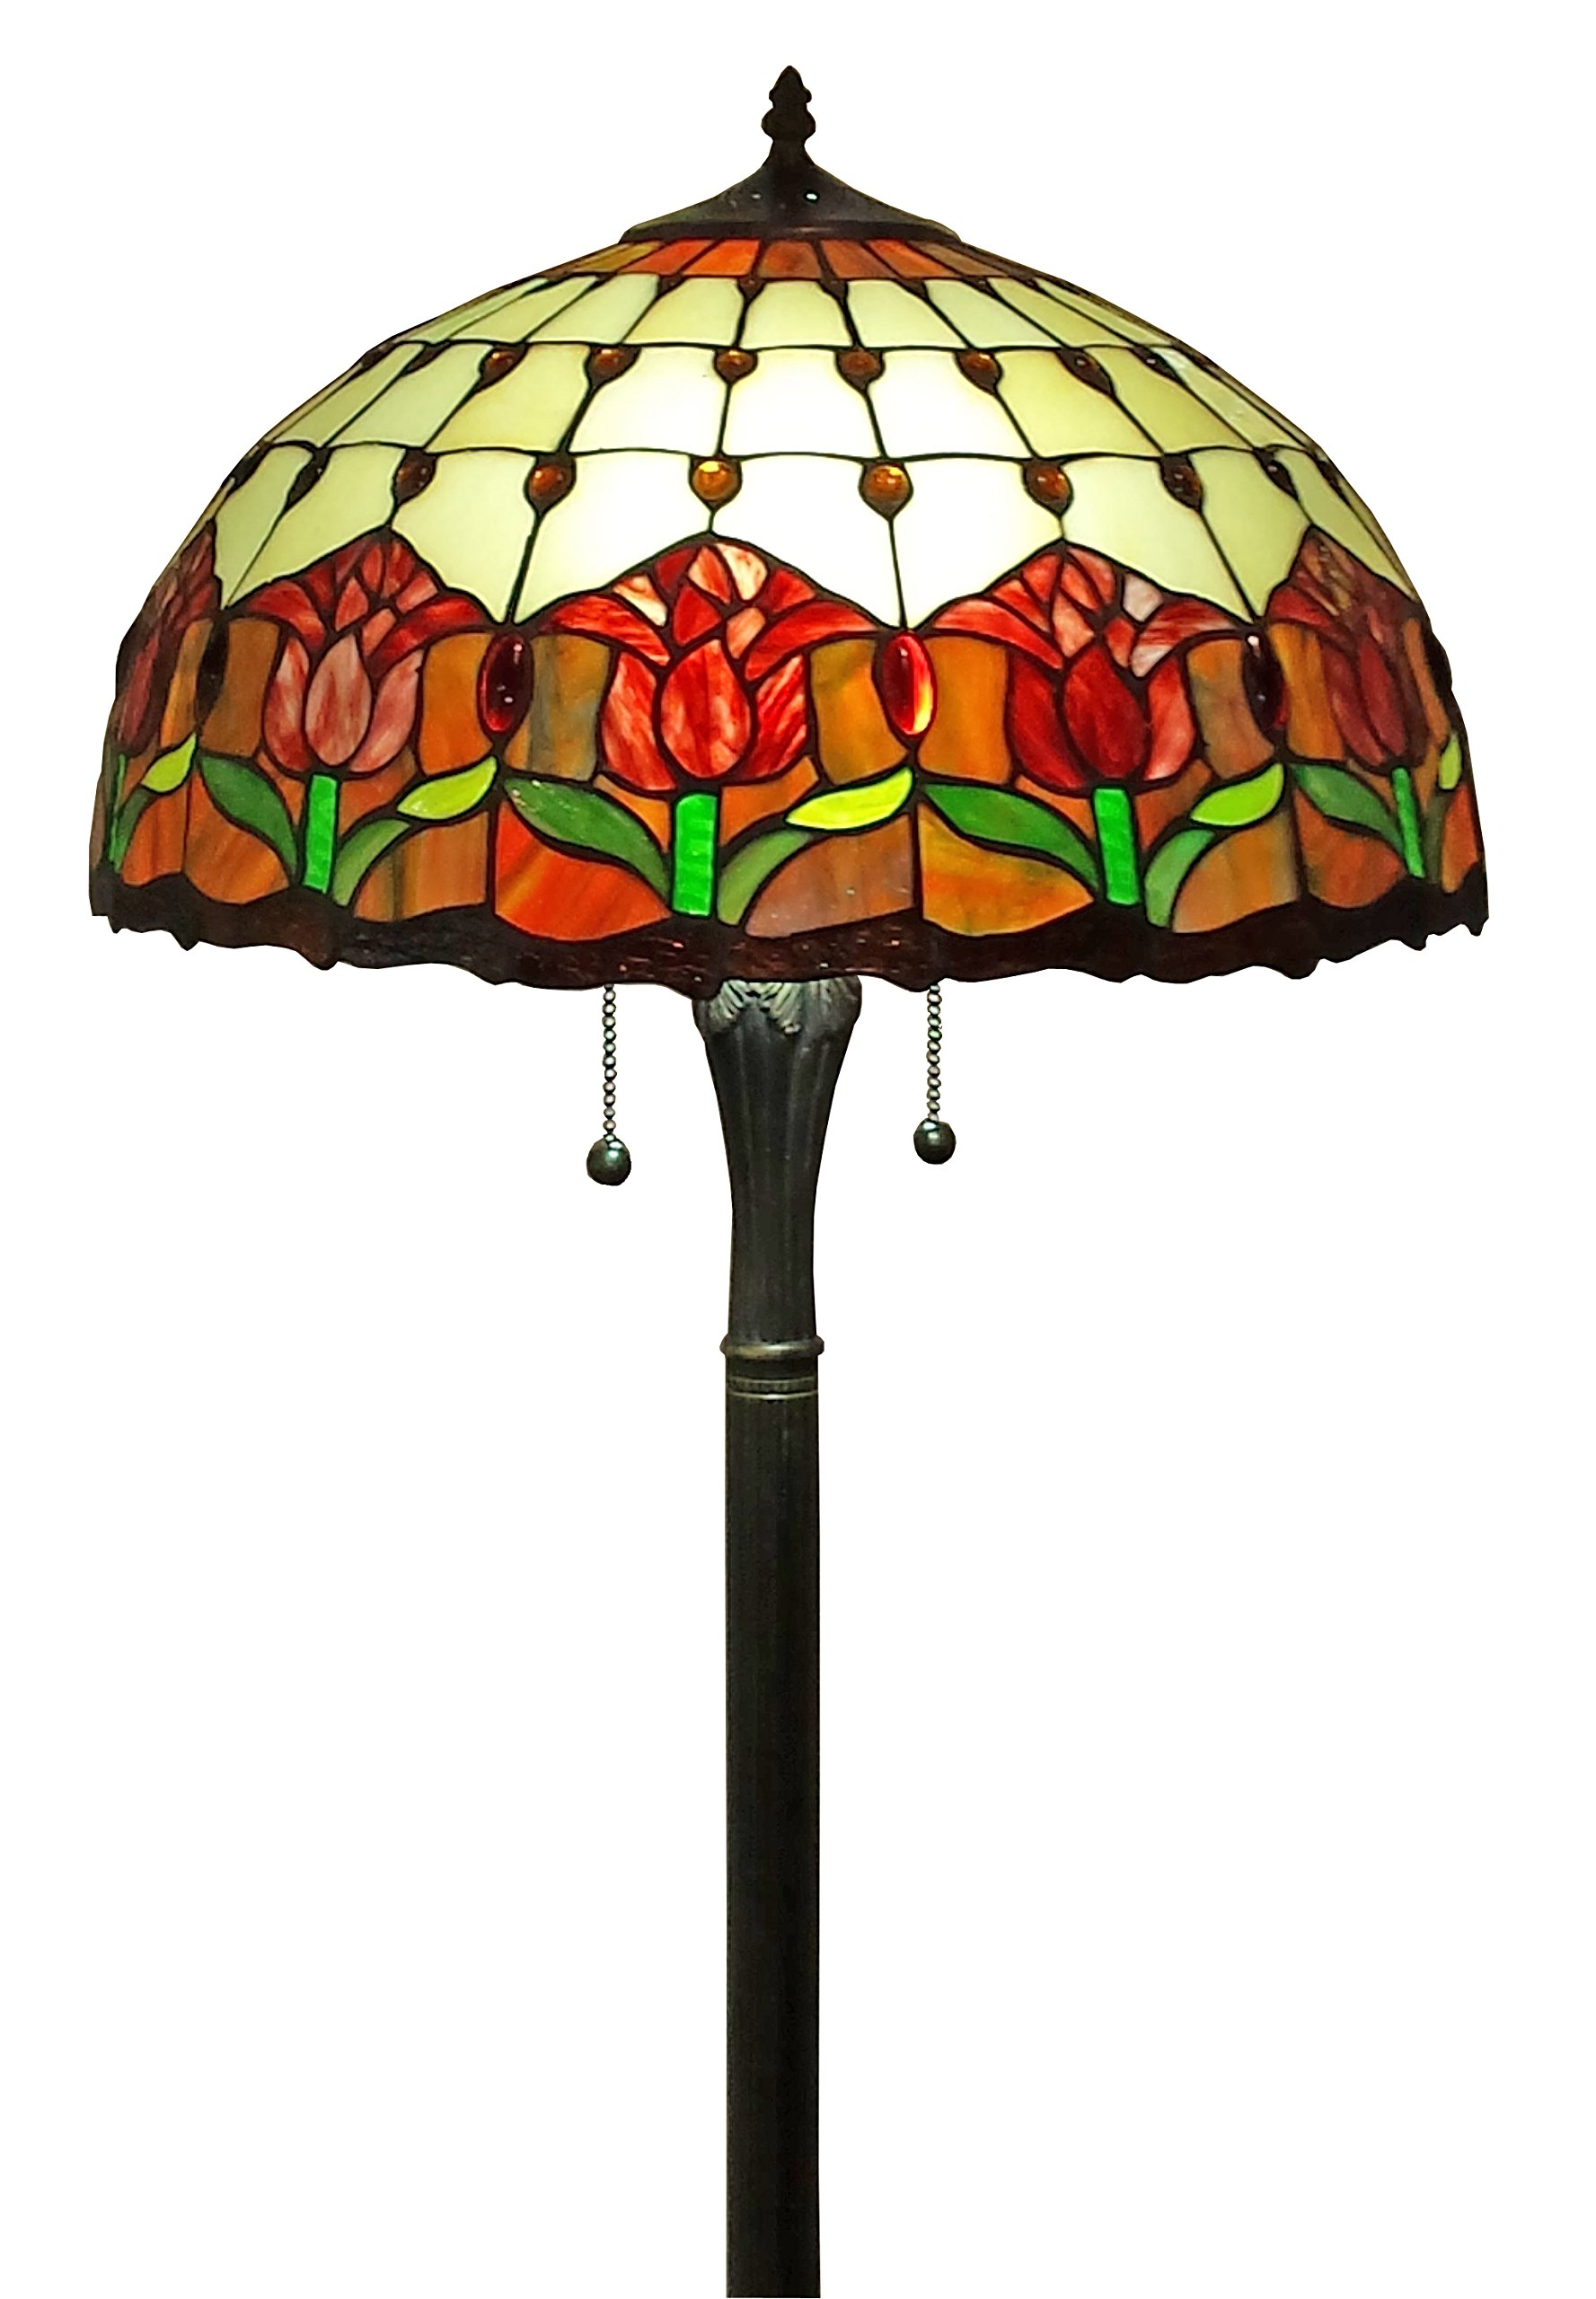 Amora Lighting AM002FL18 Tiffany Style Tulips Floor Lamp 18-Inch Shade, Multi by Amora Lighting